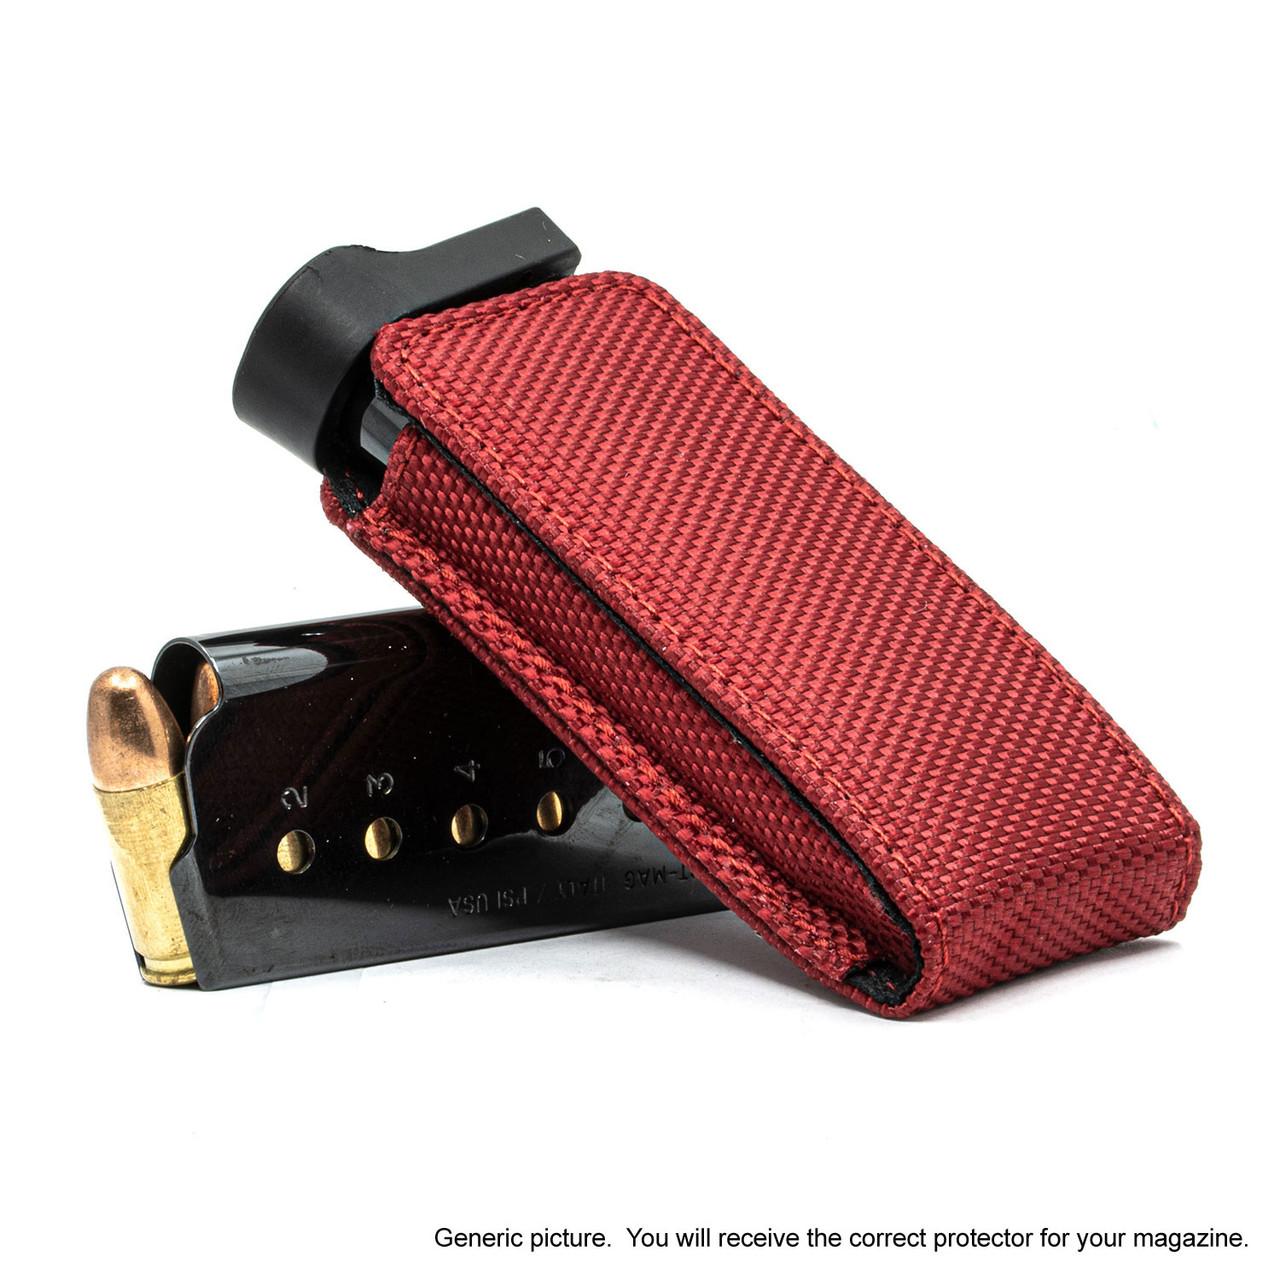 Mossberg MC2c Red Covert Magazine Pocket Protector